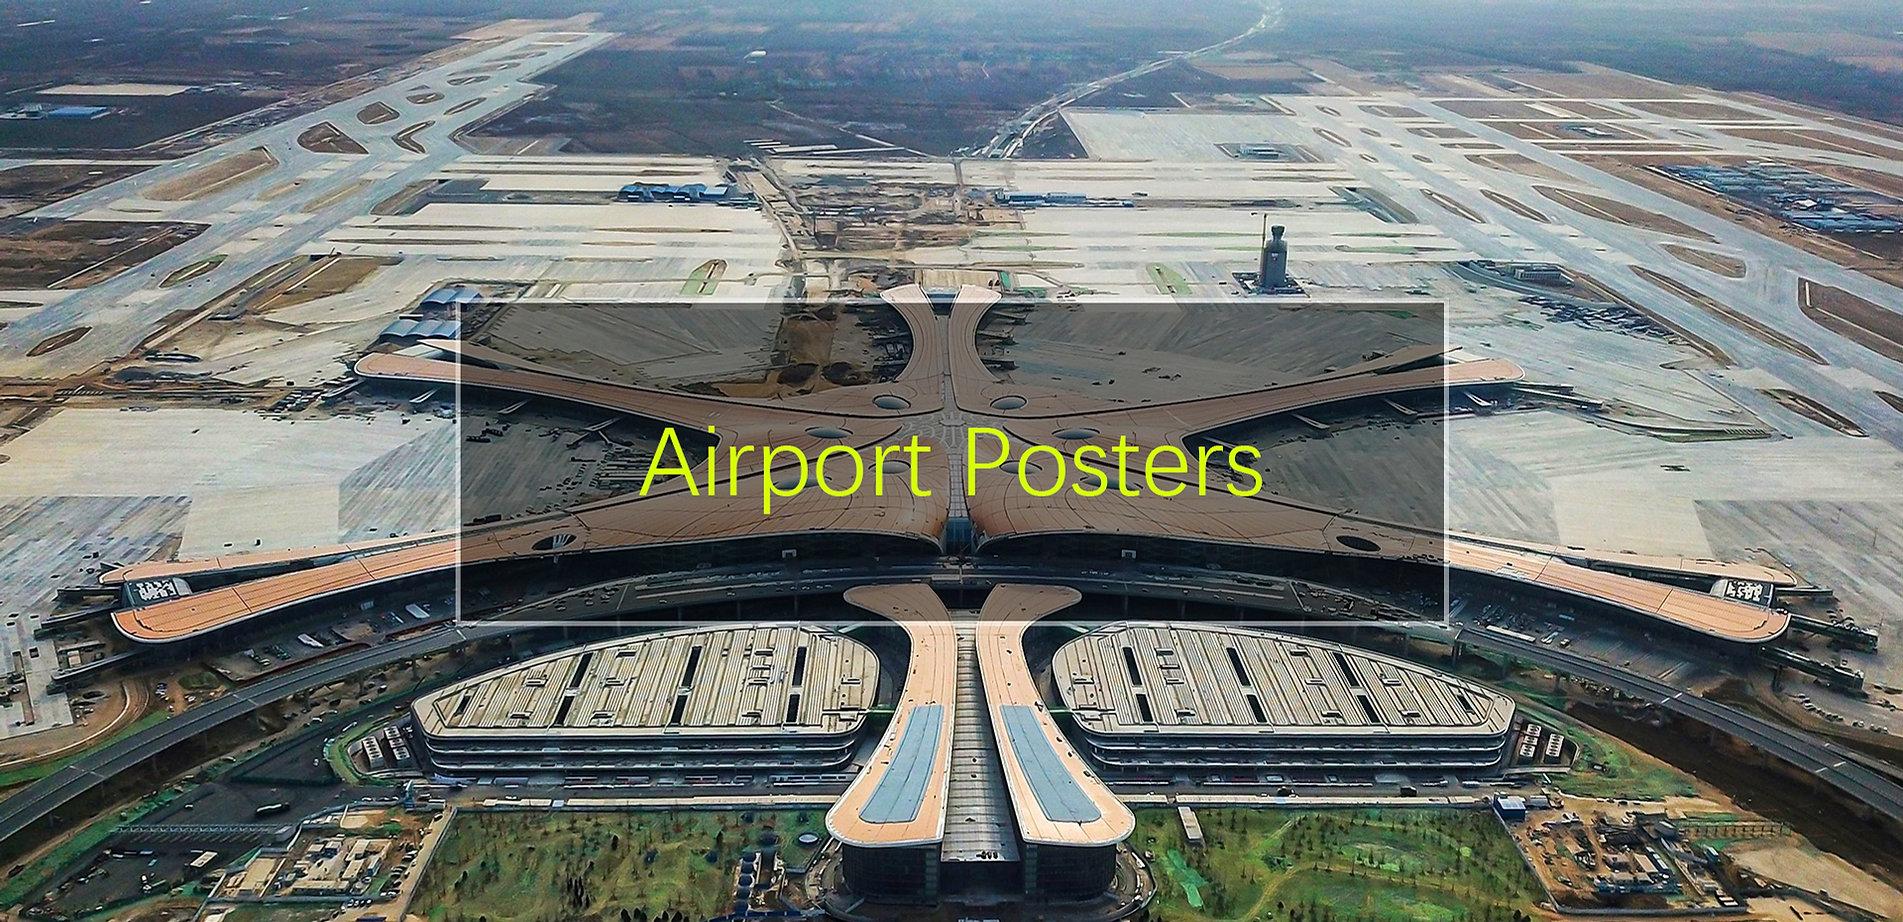 Airport Posters.jpg